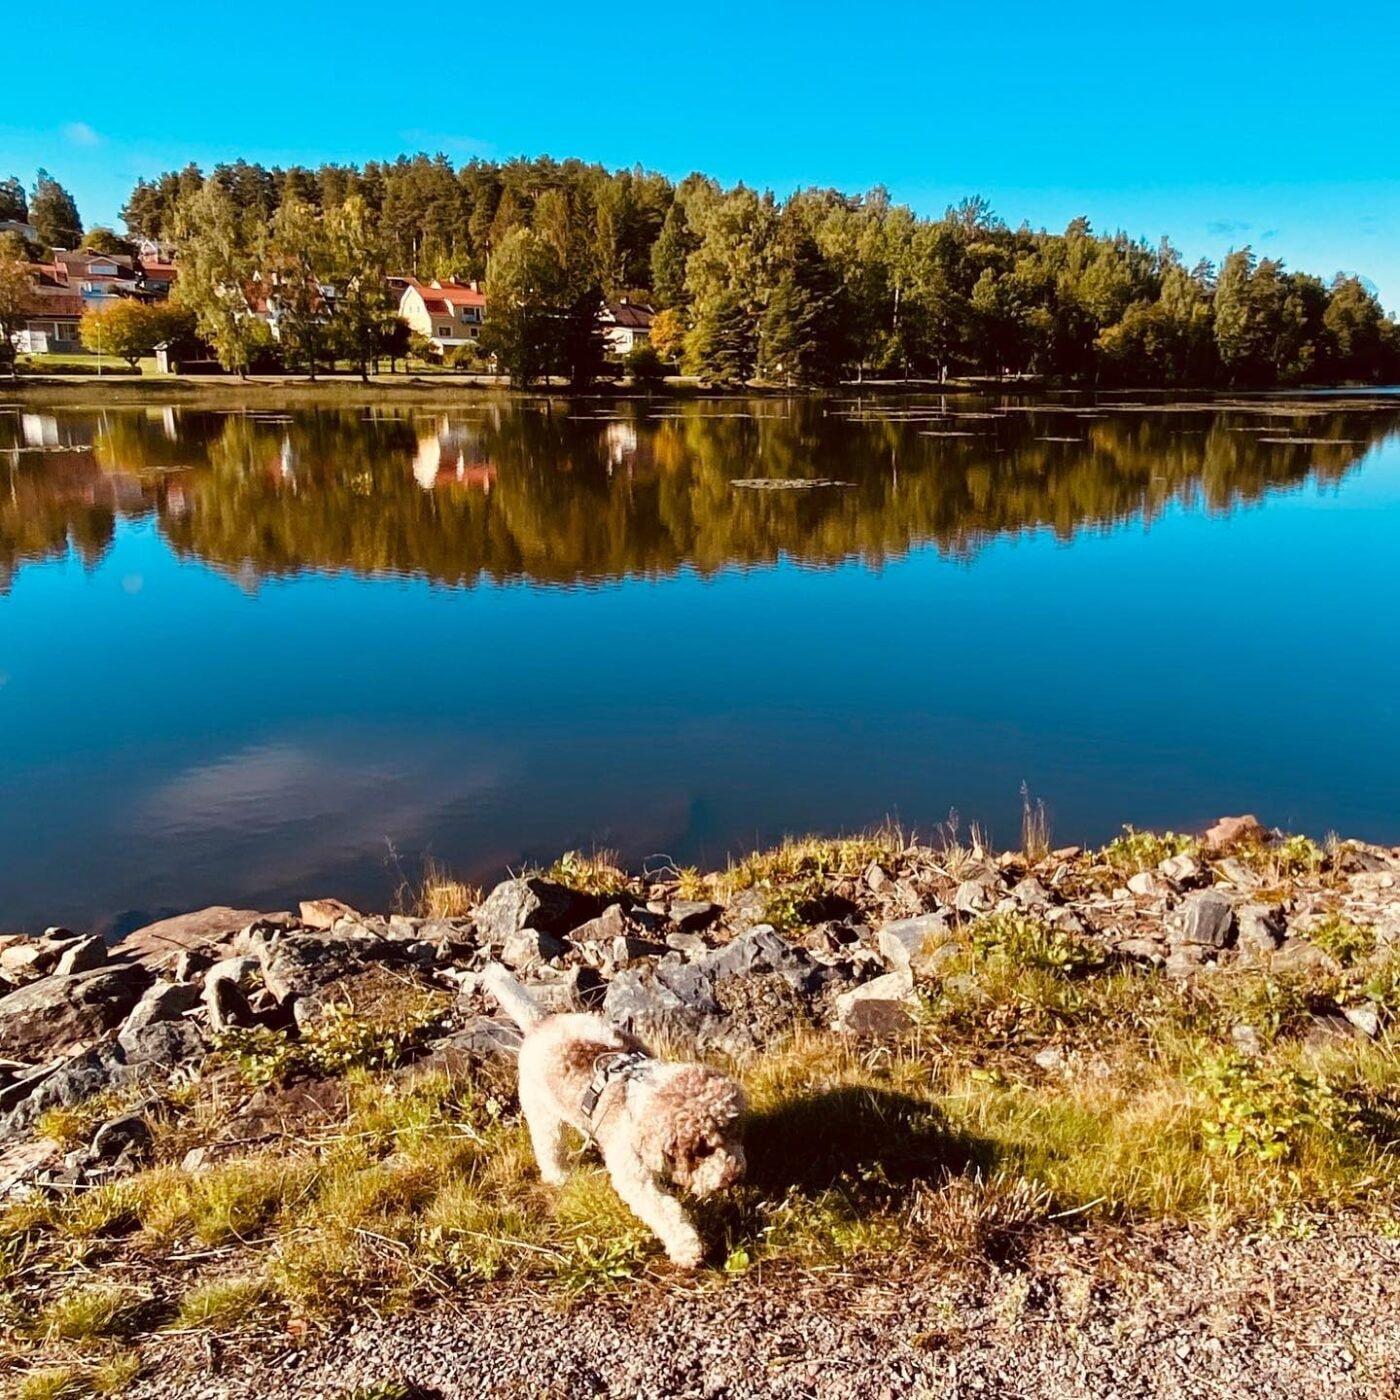 Today's morning walk in Falun. #lagottosofinstagram #lagottopuppy #italianwaterdog #truffledog #lagottoromagnolo_daily #happydoglife #Lagotto #Dogs #DogsOfInstagram #Petstagram #Pets #Dogstagram #MyLife #MyDailyLife #PappaJagVillHaEnItalienare #MacLagotto #Falun #Sweden #FF #l4l #instafollow @knappare @liminglindblad @k.rowntree @taxen_coco @h3lvetesjavlar This was posted by my Dad: @kristerlindholmfalun